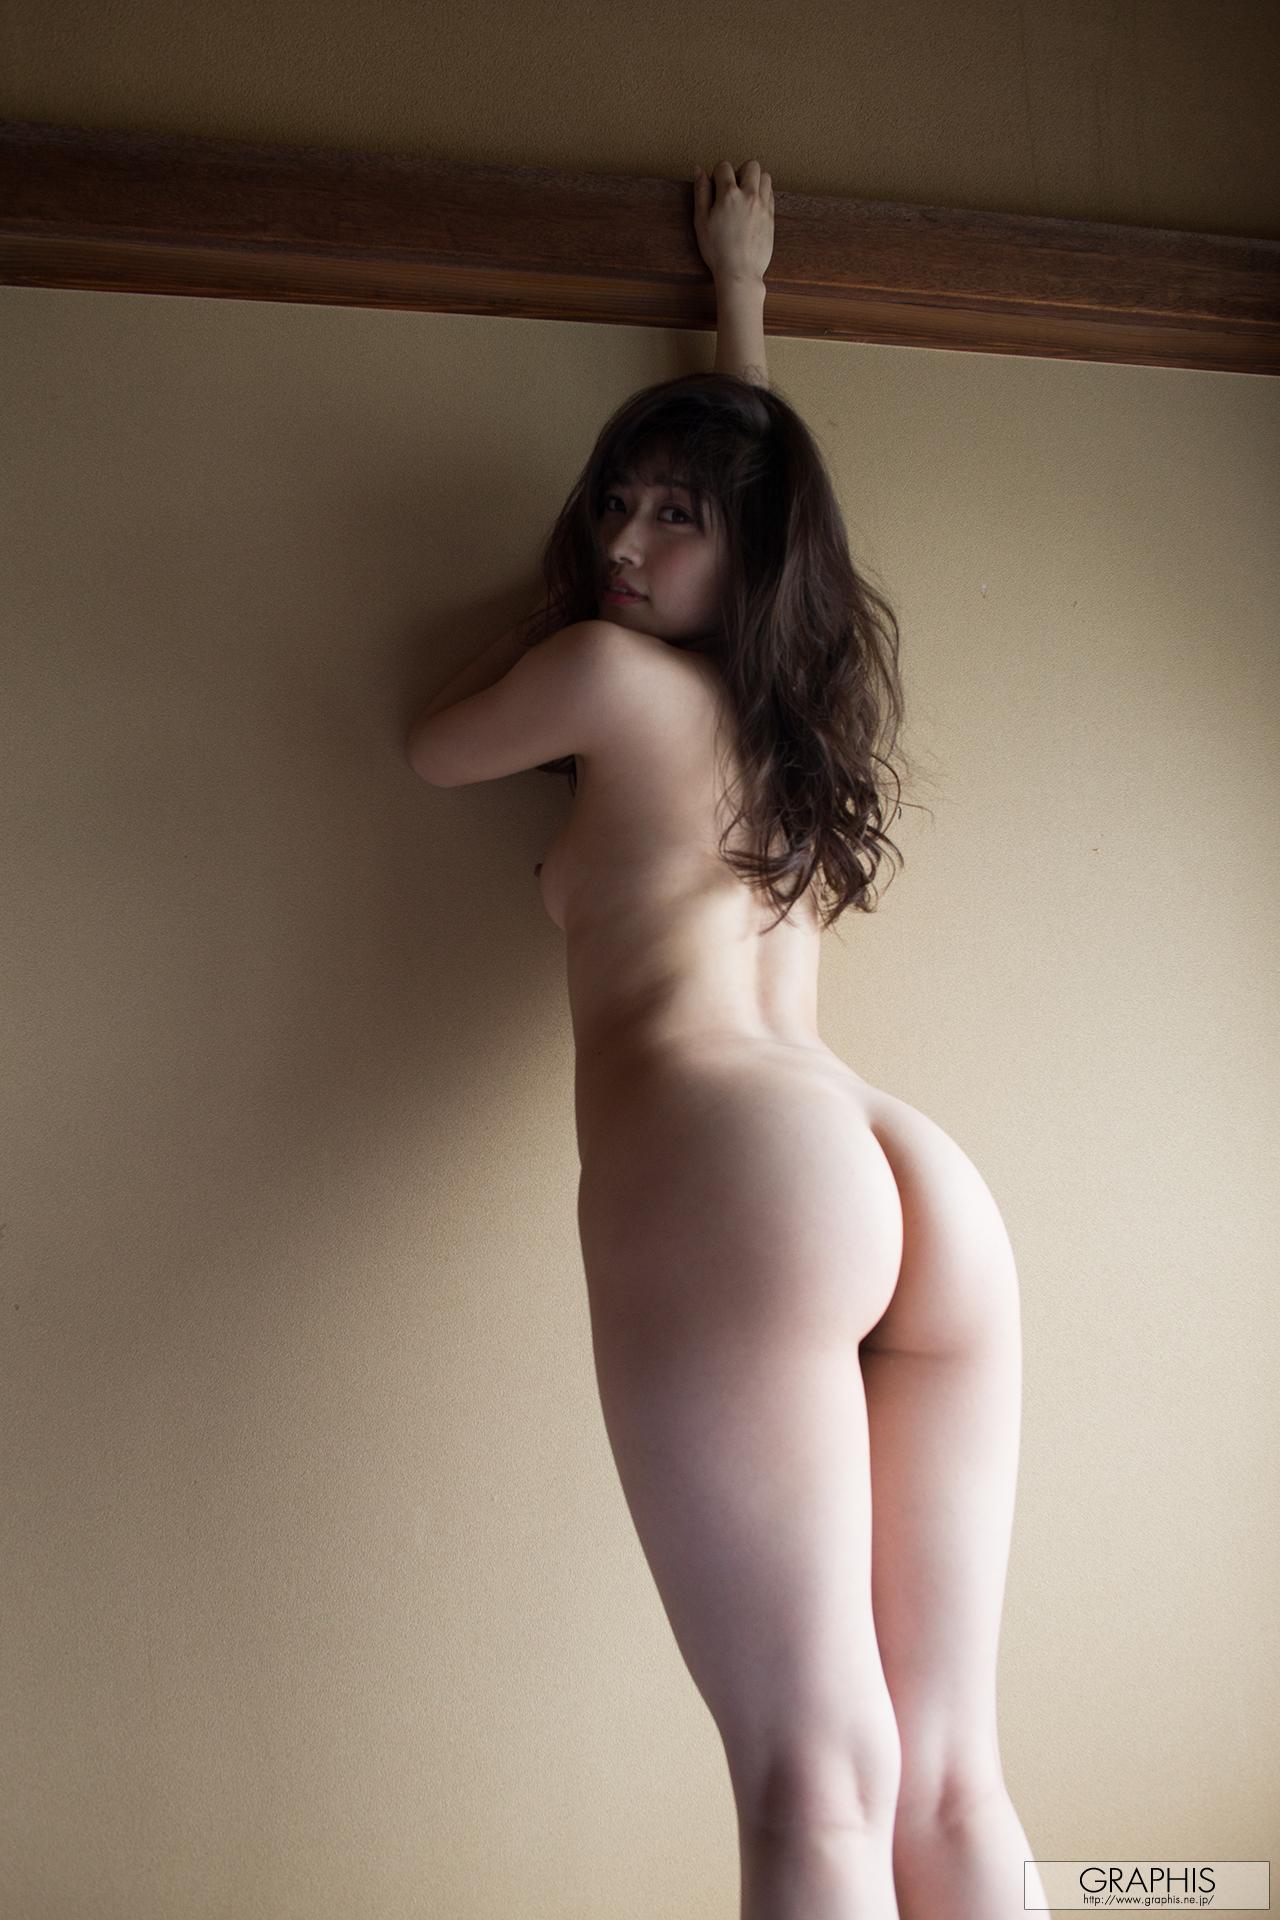 image http://scanlover.com/assets/images/3774-yB9BAO1m0pmcHUvg.jpeg